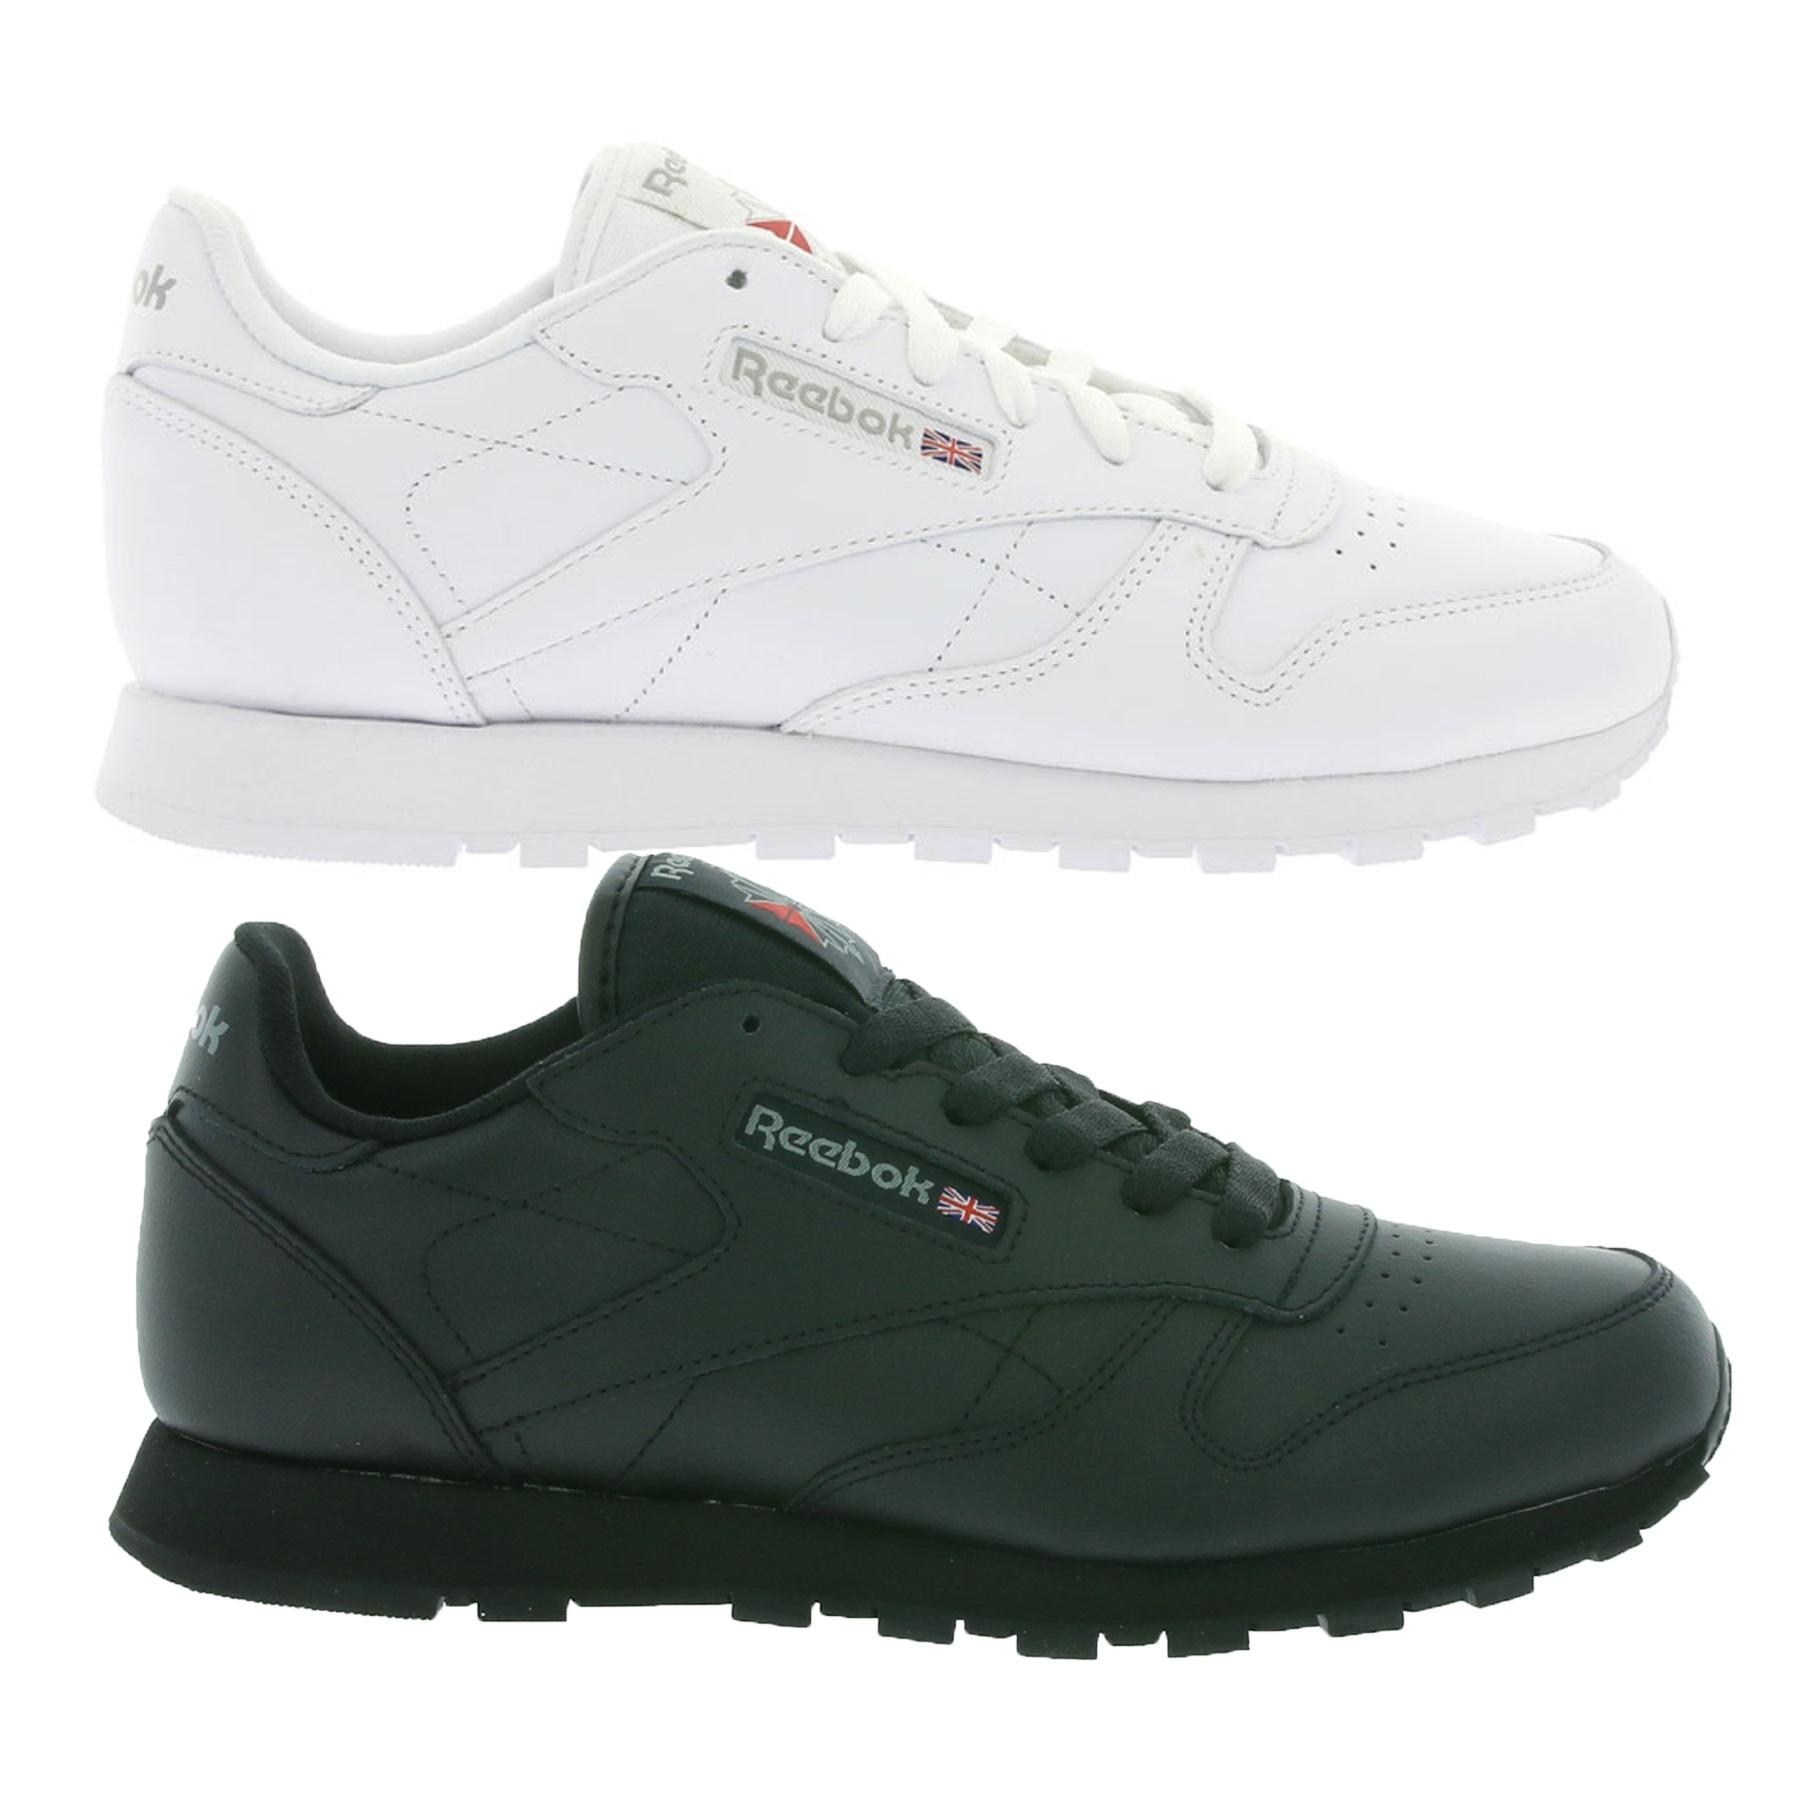 Reebok Classic Leather Kinder Echtleder Sneaker für je 29,99